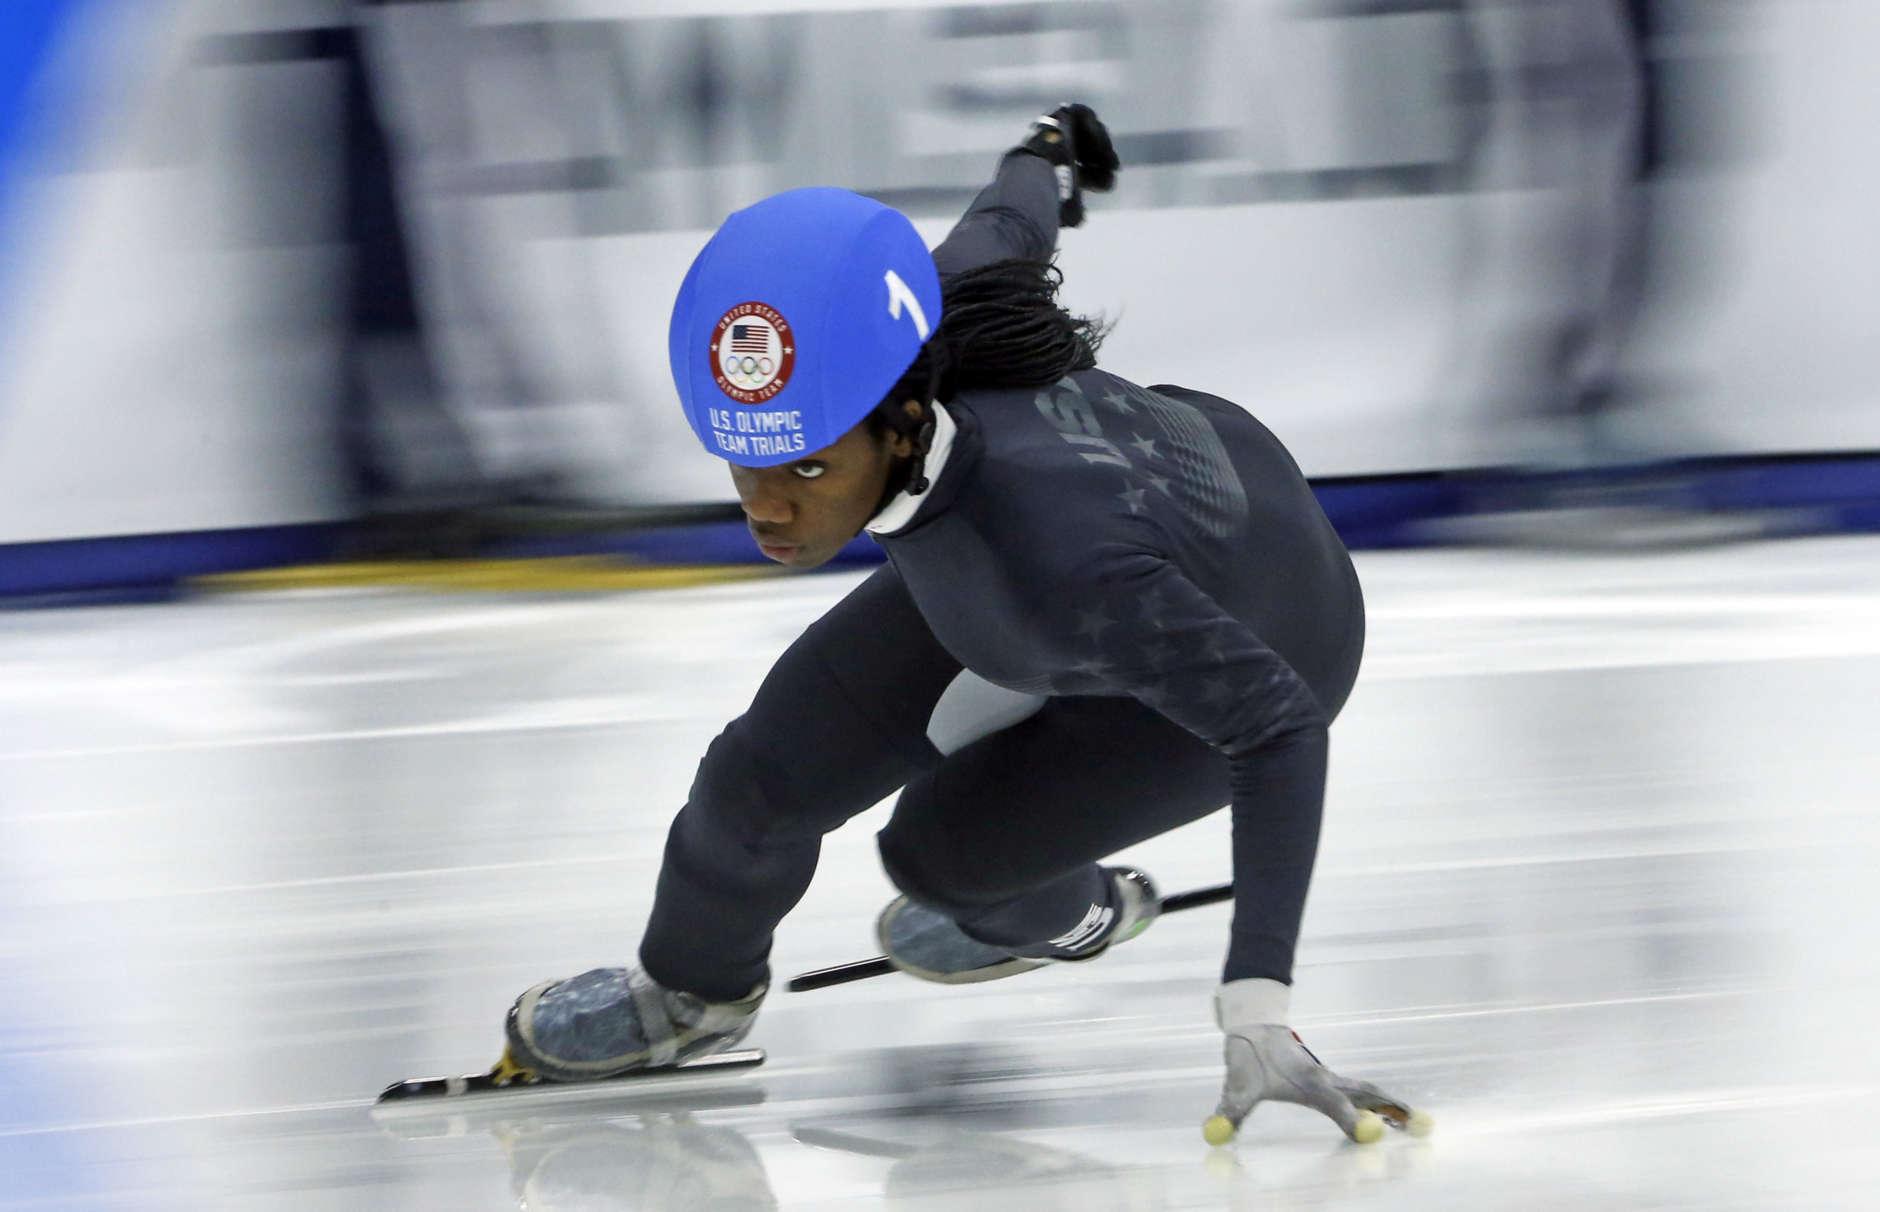 Maame Biney (1) competes in the women's 500-meter during the U.S. Olympic short track speedskating trials Saturday, Dec. 16, 2017, in Kearns, Utah. (AP Photo/Rick Bowmer)